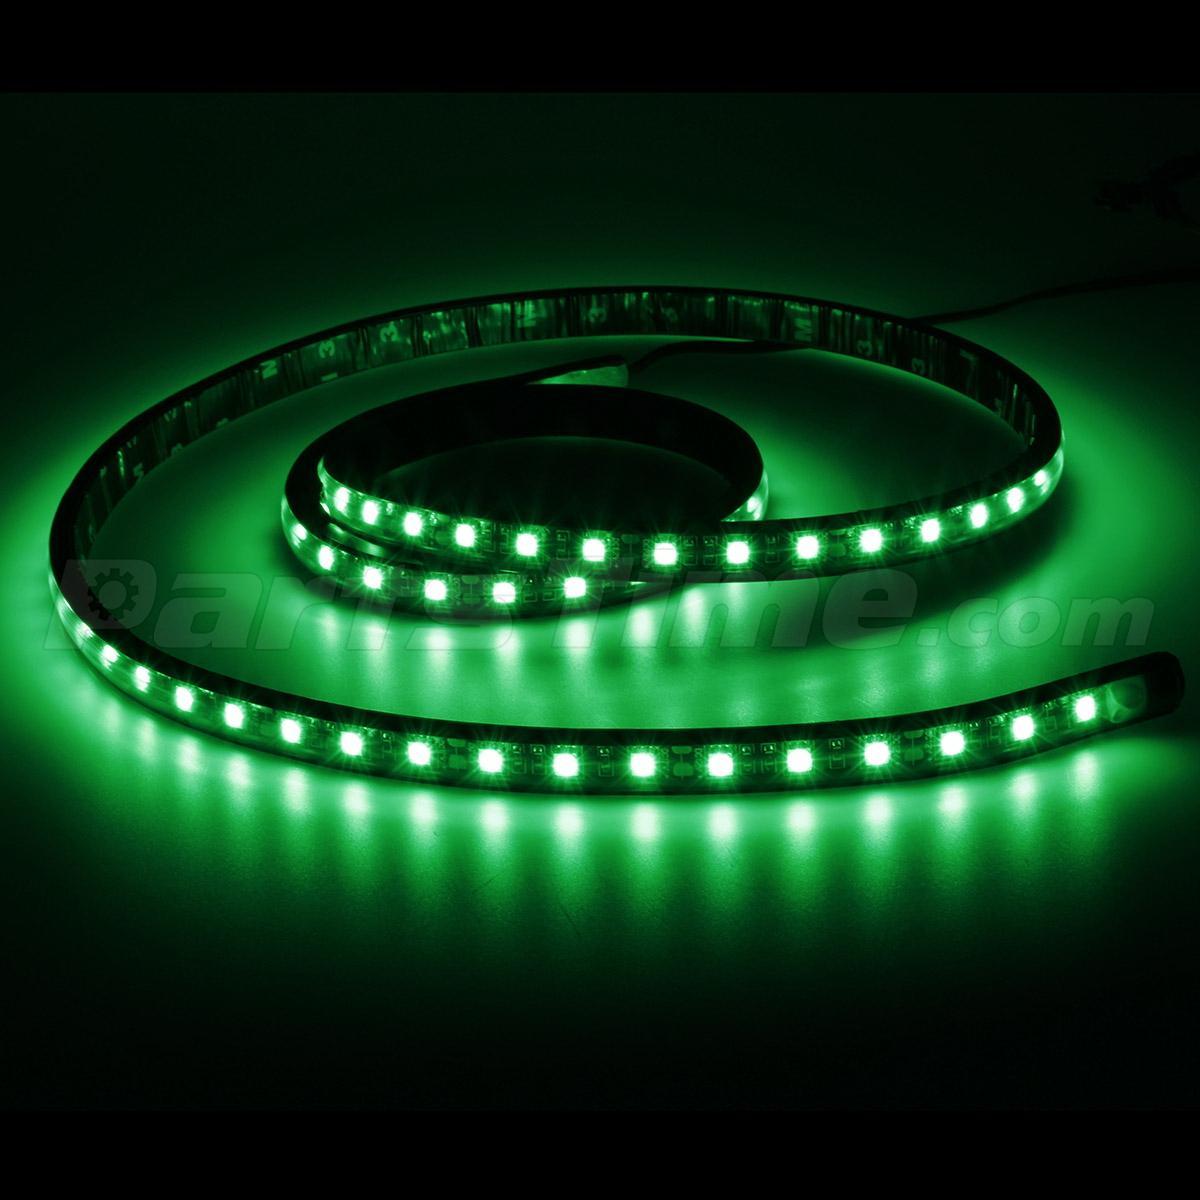 Green Led Truck Light 60 Quot Waterproof Light Bar W On Off